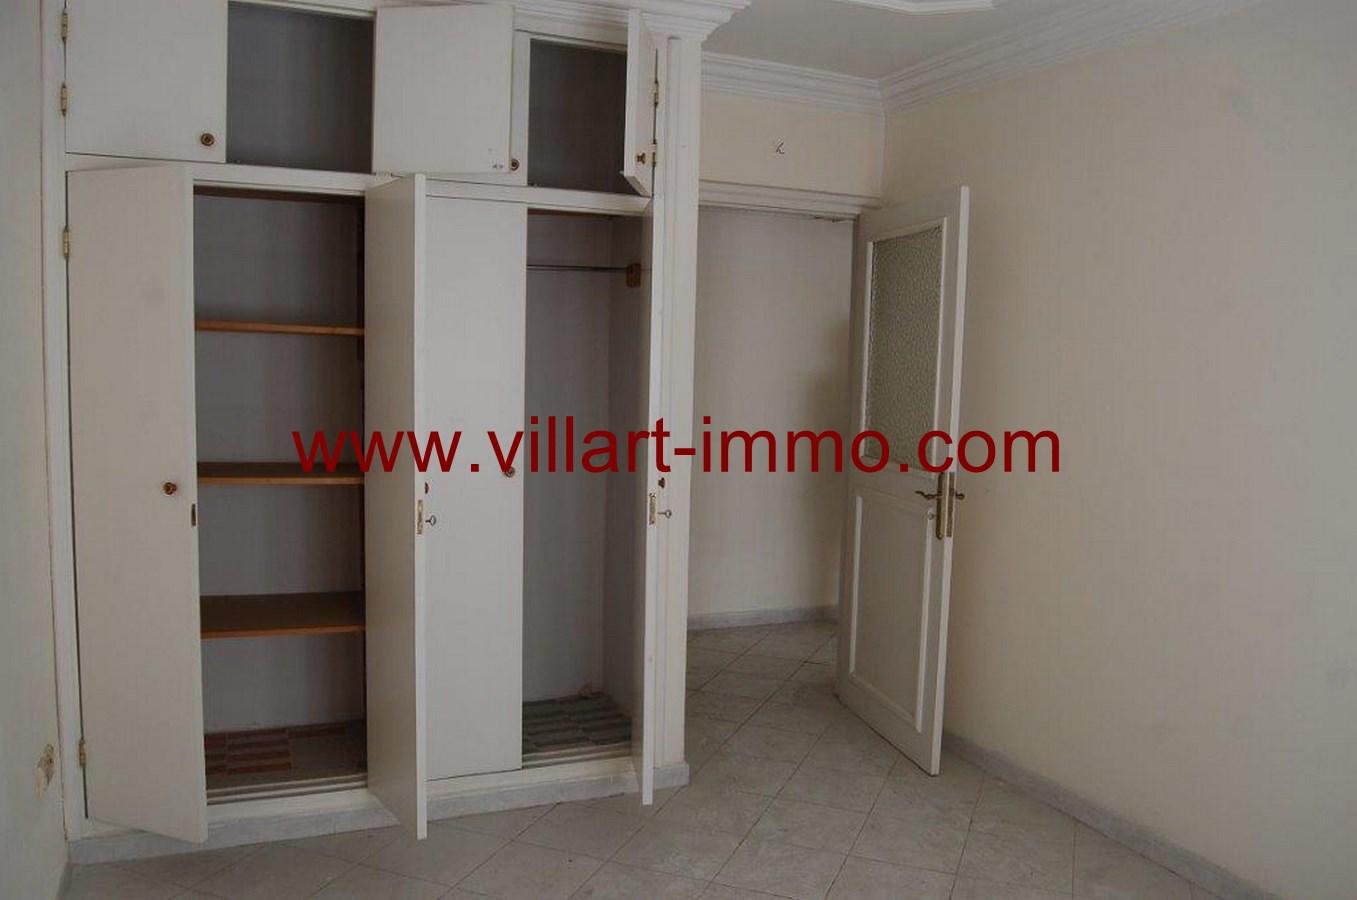 5-location-appartement-non-meuble-tanger-chambre-1-l877-villart-immo